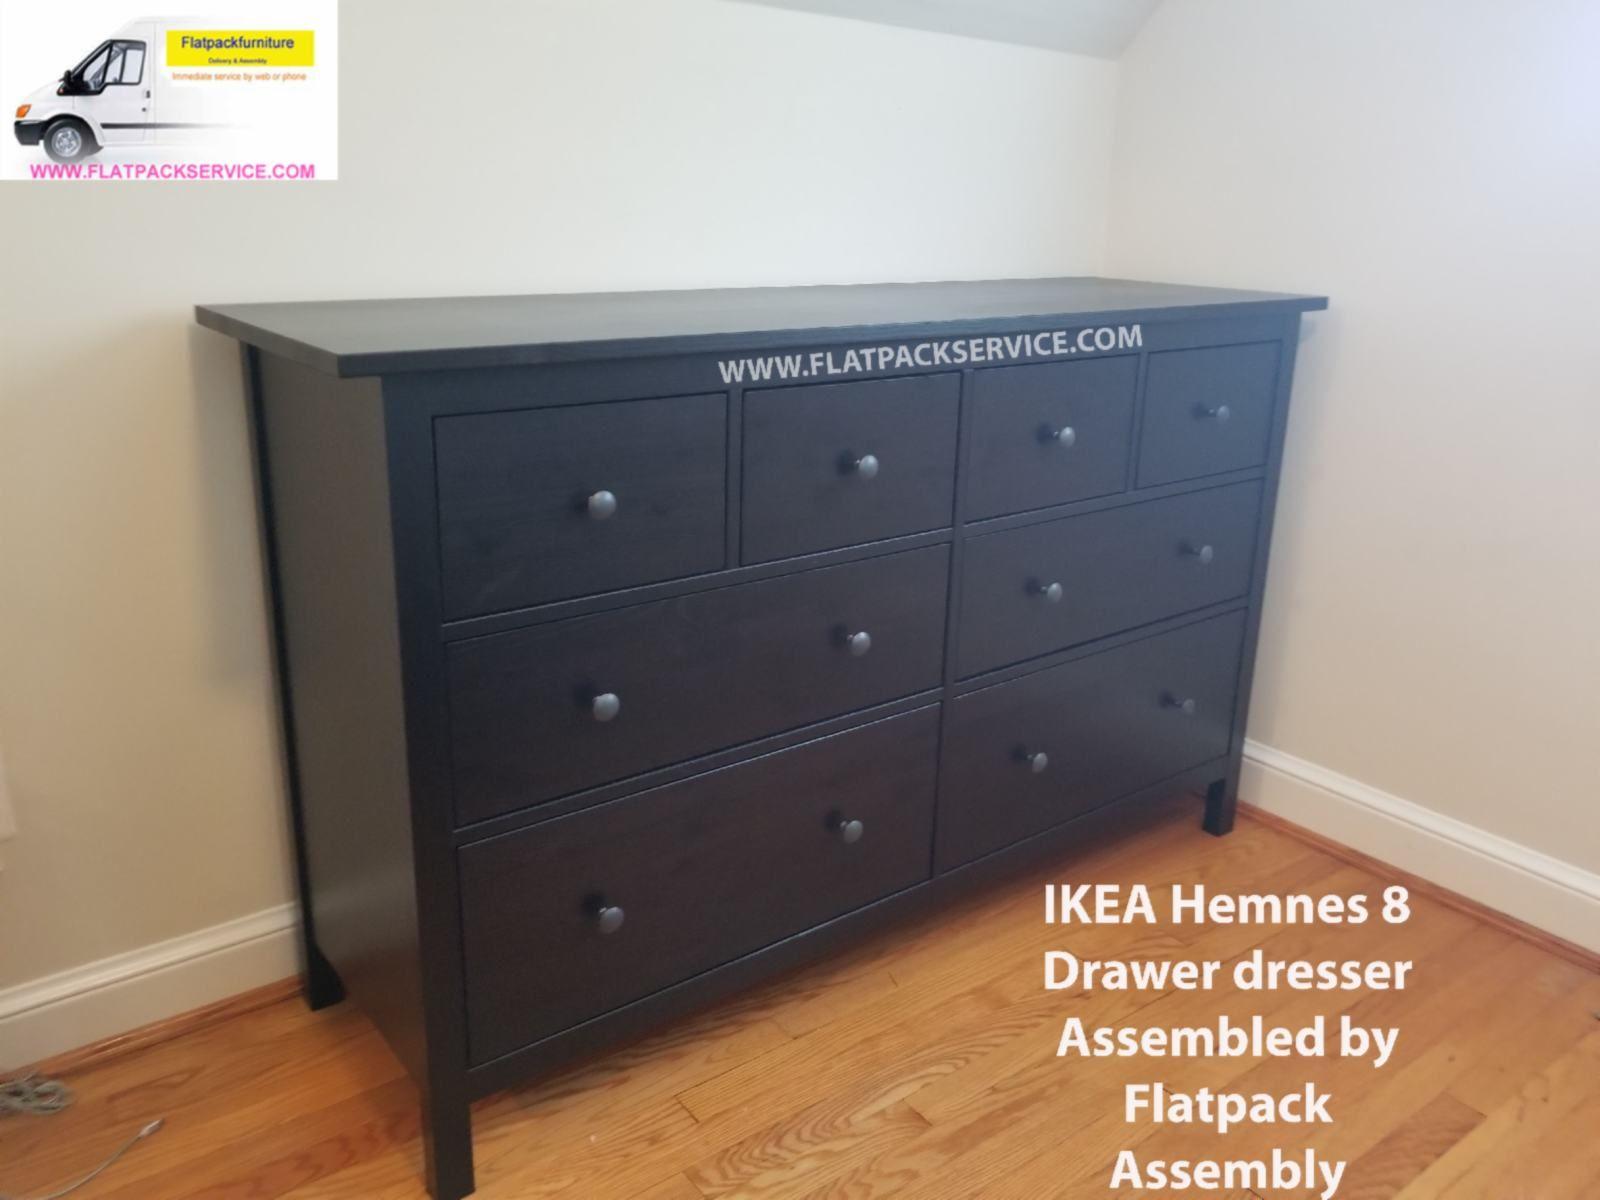 ... Of Drawers U2013 IKEA MALM 6 Drawer Dresser HEMNES 8 Drawer Dresser   White  Stain IKEA Dressers Assembled Assembly Service U2013 IKEA Furniture Assembly U0026  Help ...